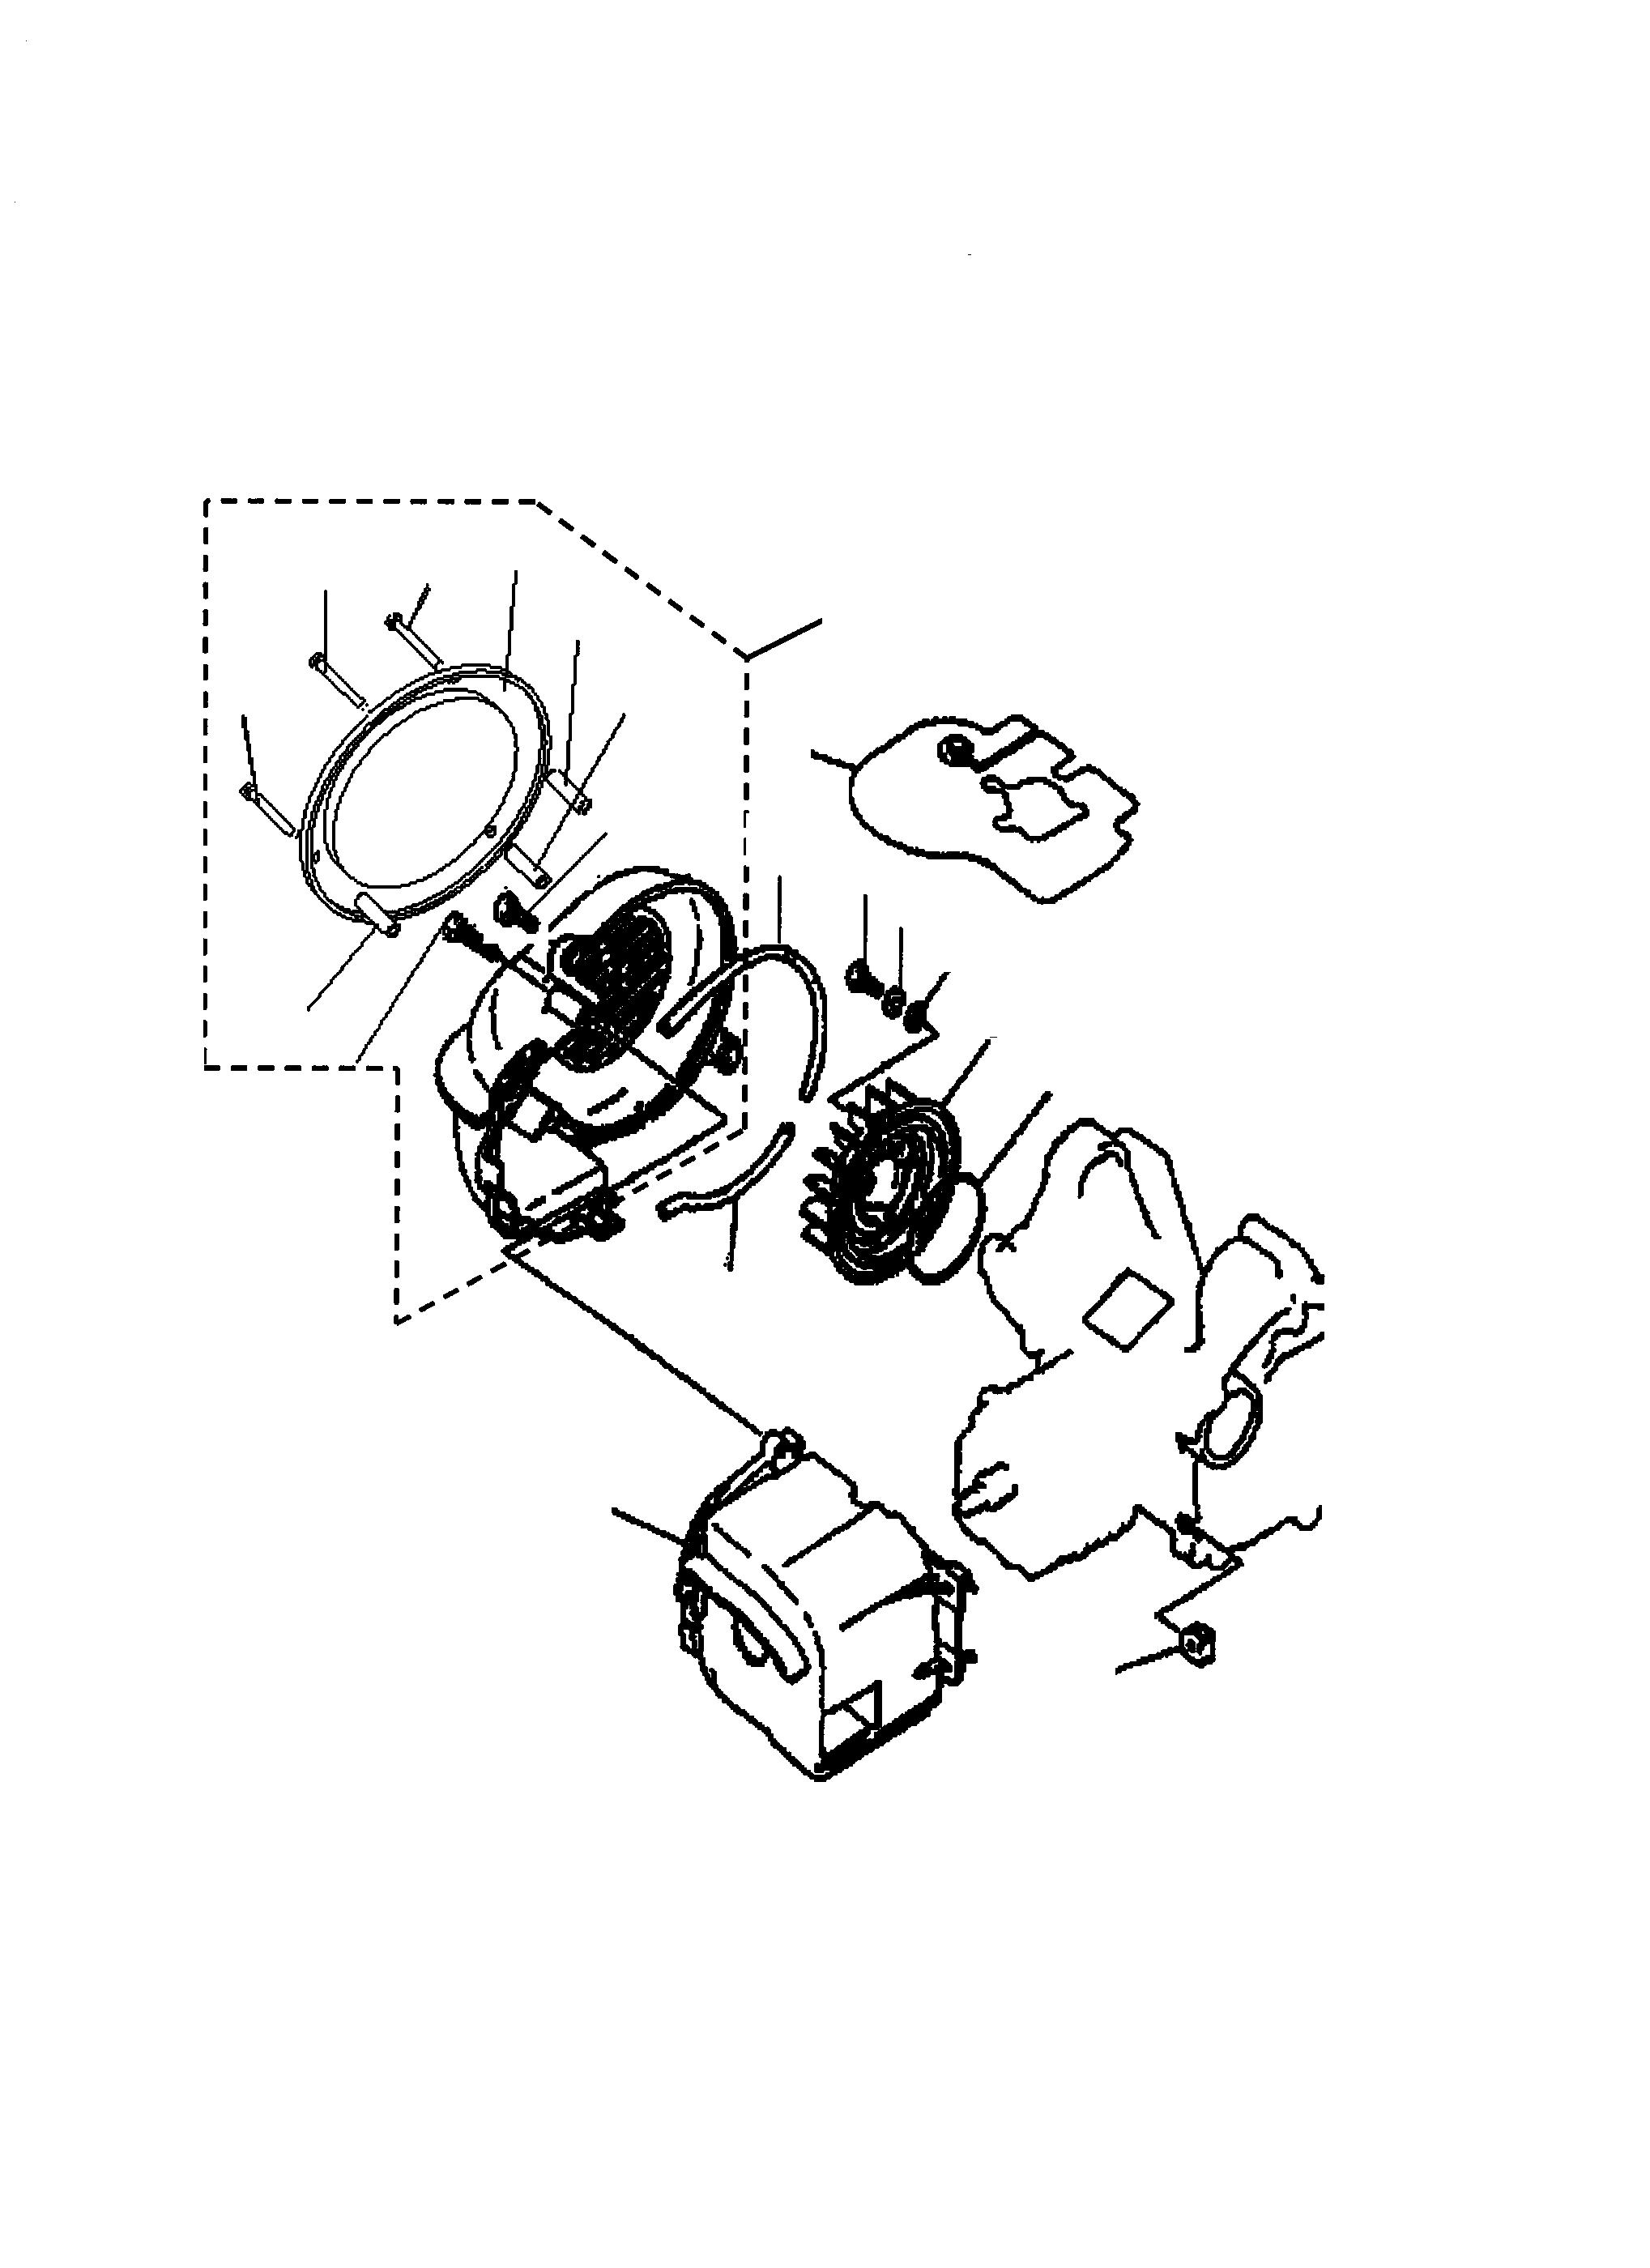 Luftkühlung / Ventilator